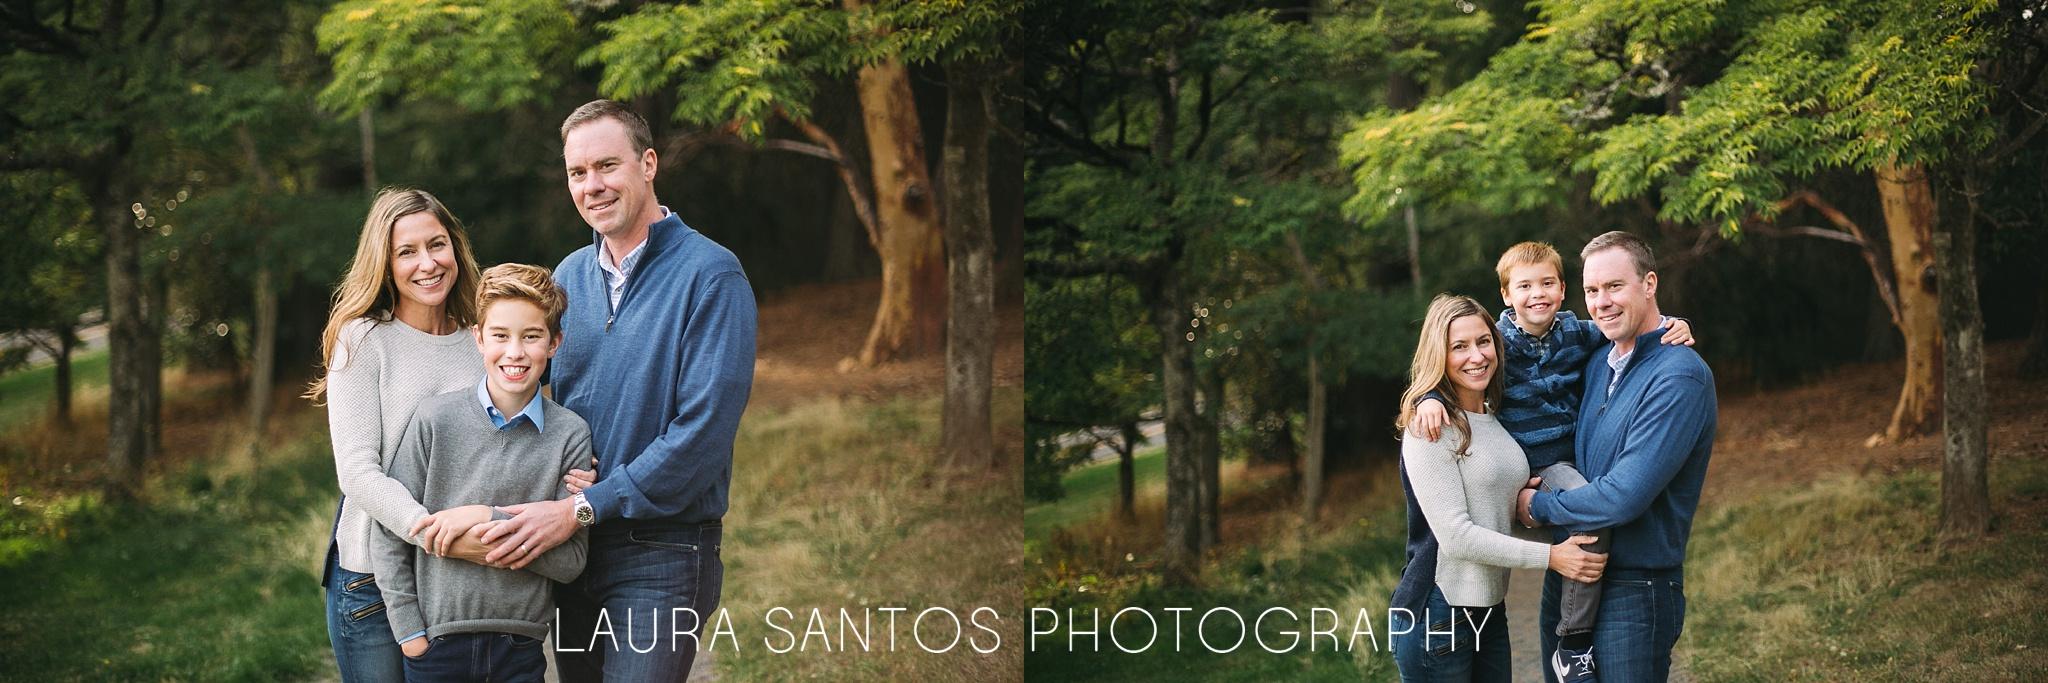 Laura Santos Photography Portland Oregon Family Photographer_0392.jpg